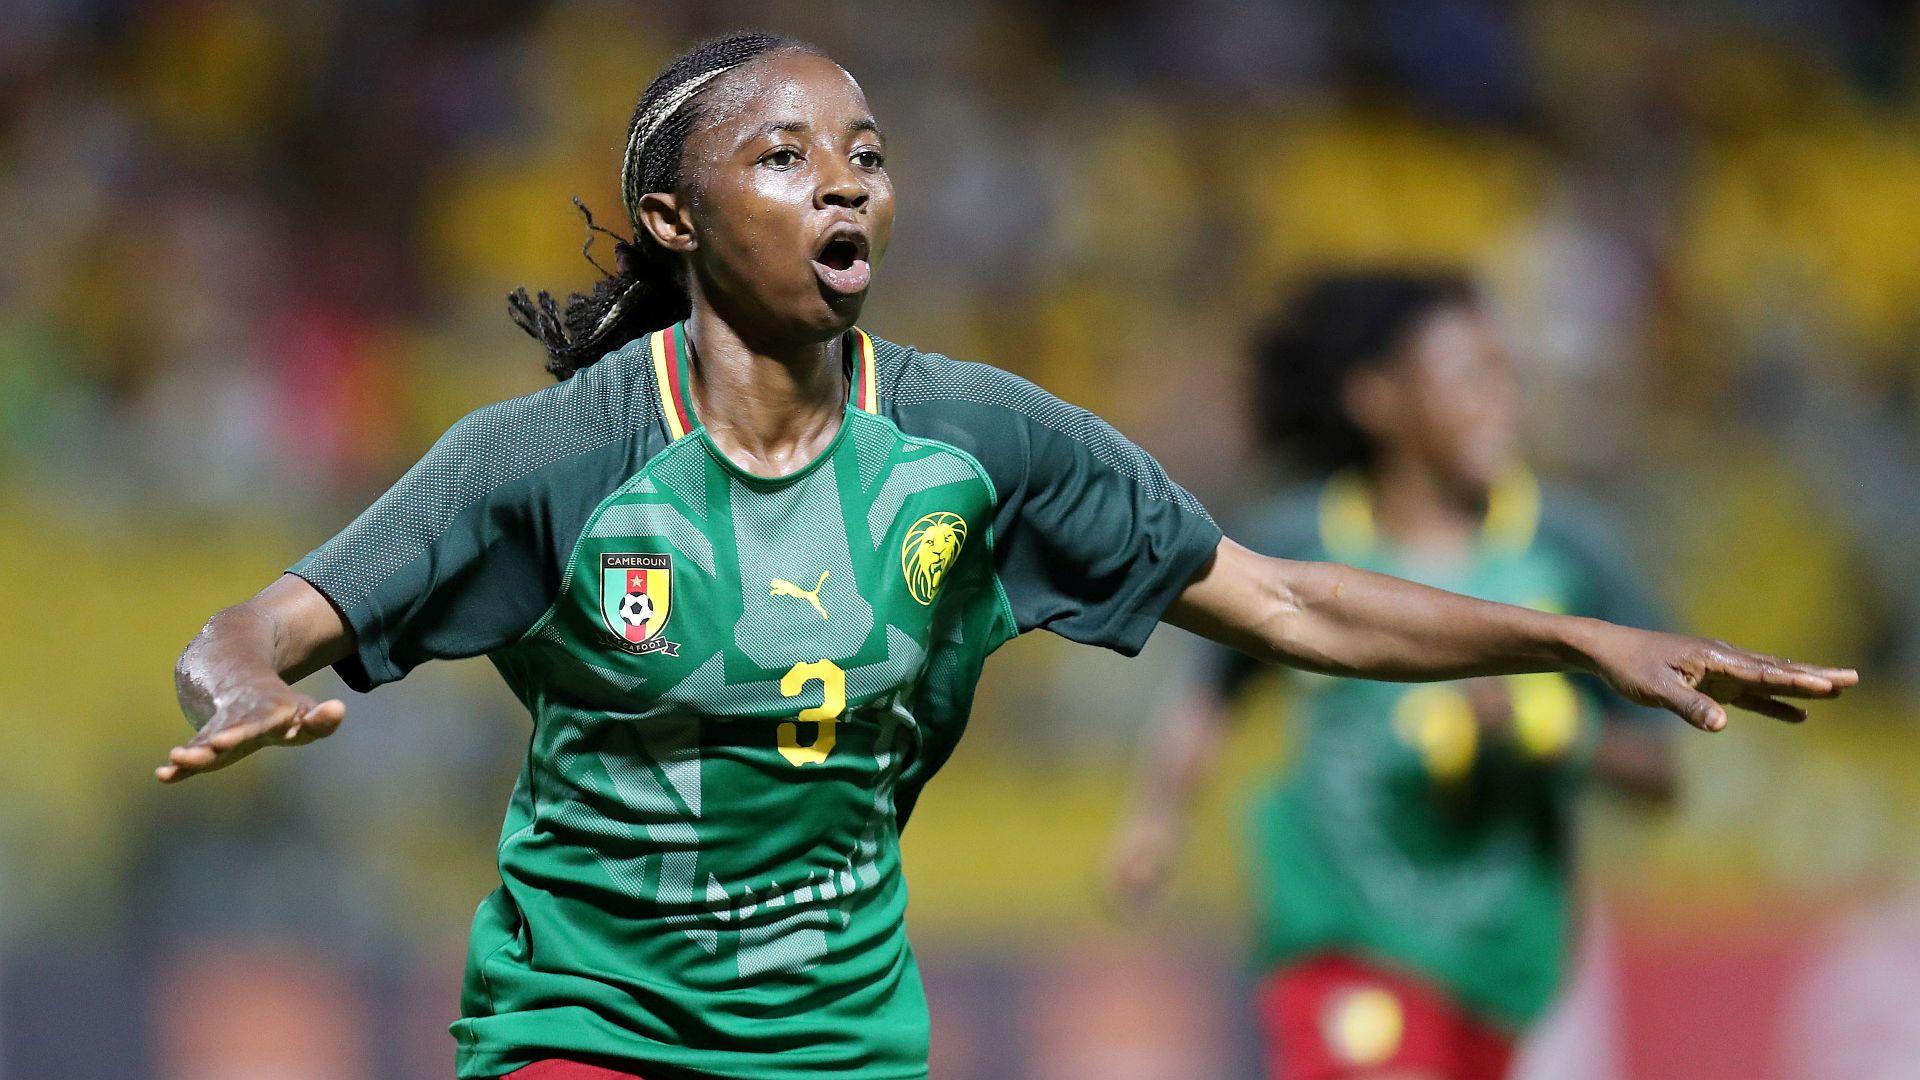 Ajara Nchout Njoya of Cameroon